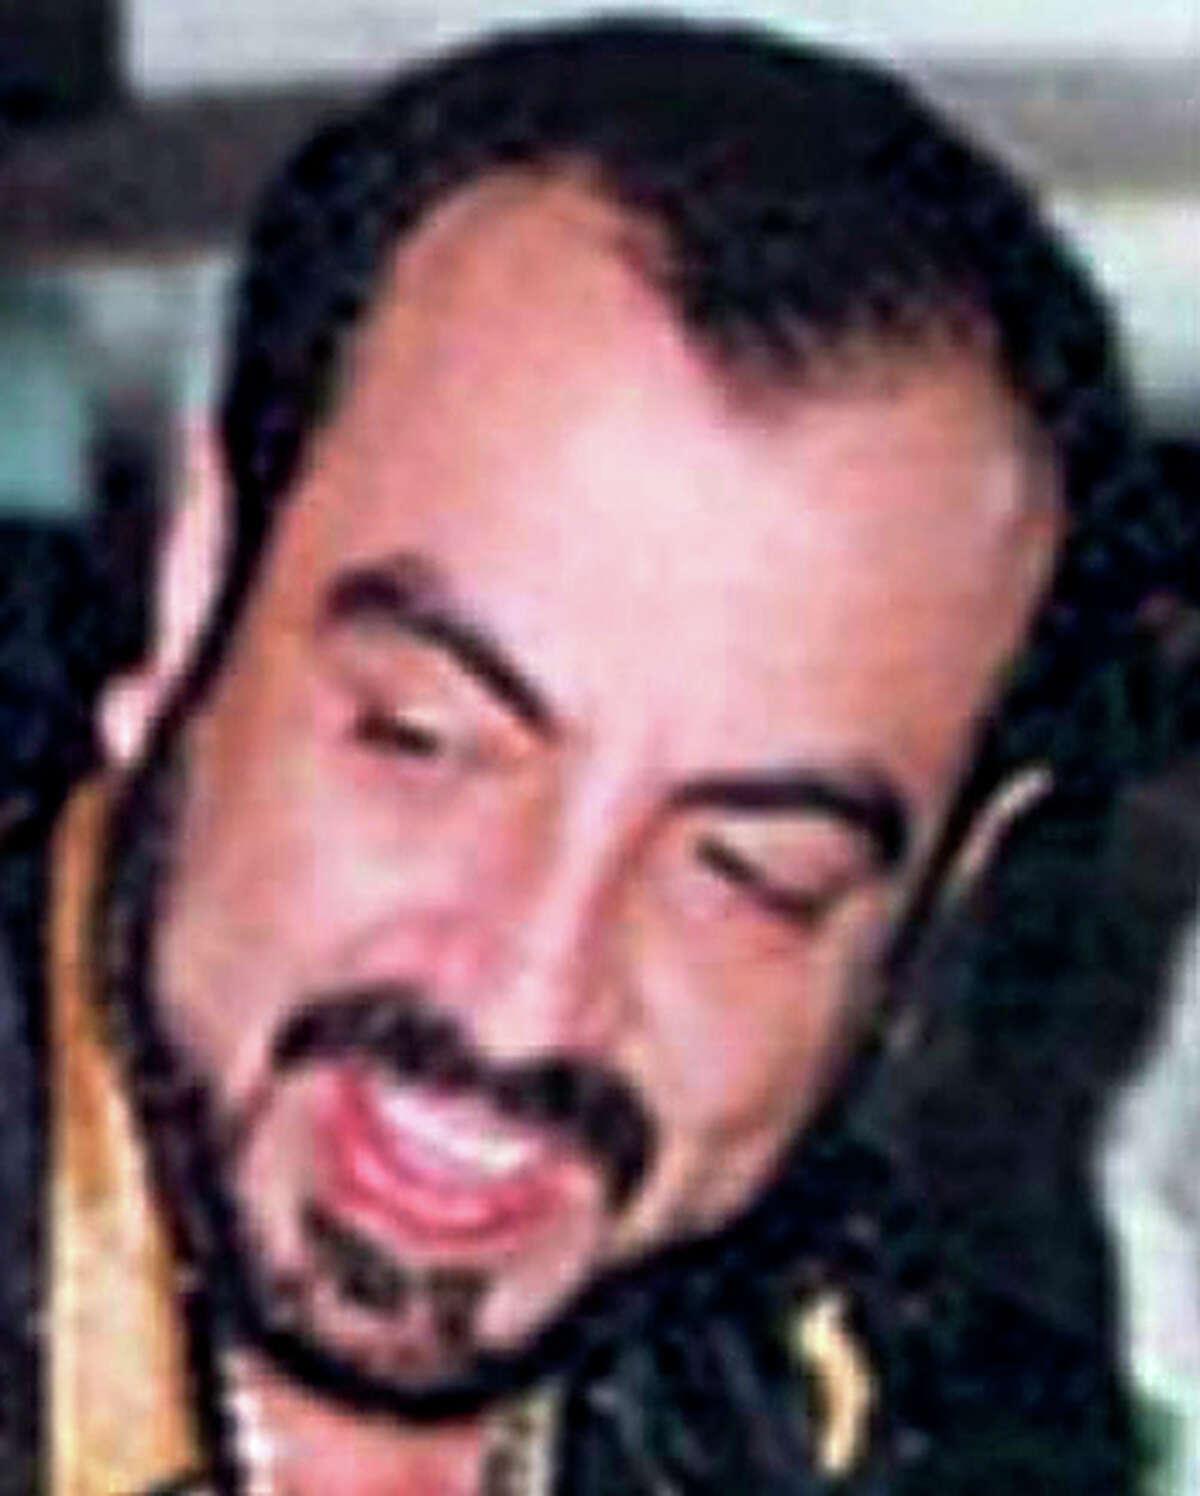 Arturo Beltran Leyva